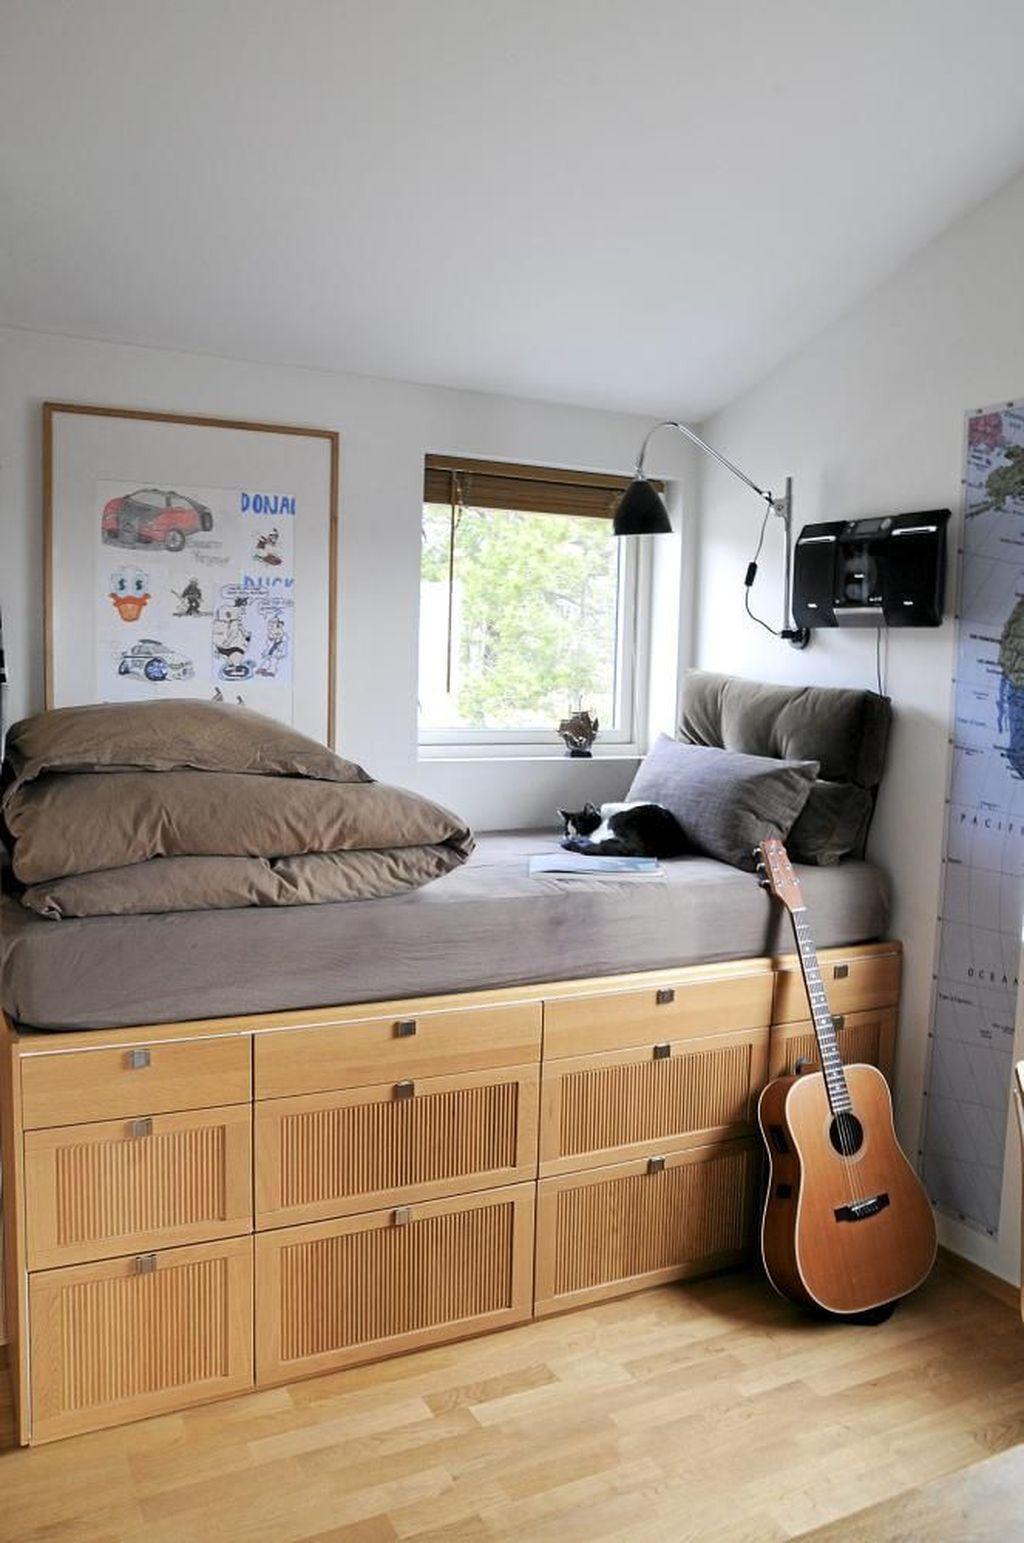 31 Admirable Tiny Bedroom Design Ideas Pimphomee Tiny Bedroom Design Small Room Design Tiny Bedroom